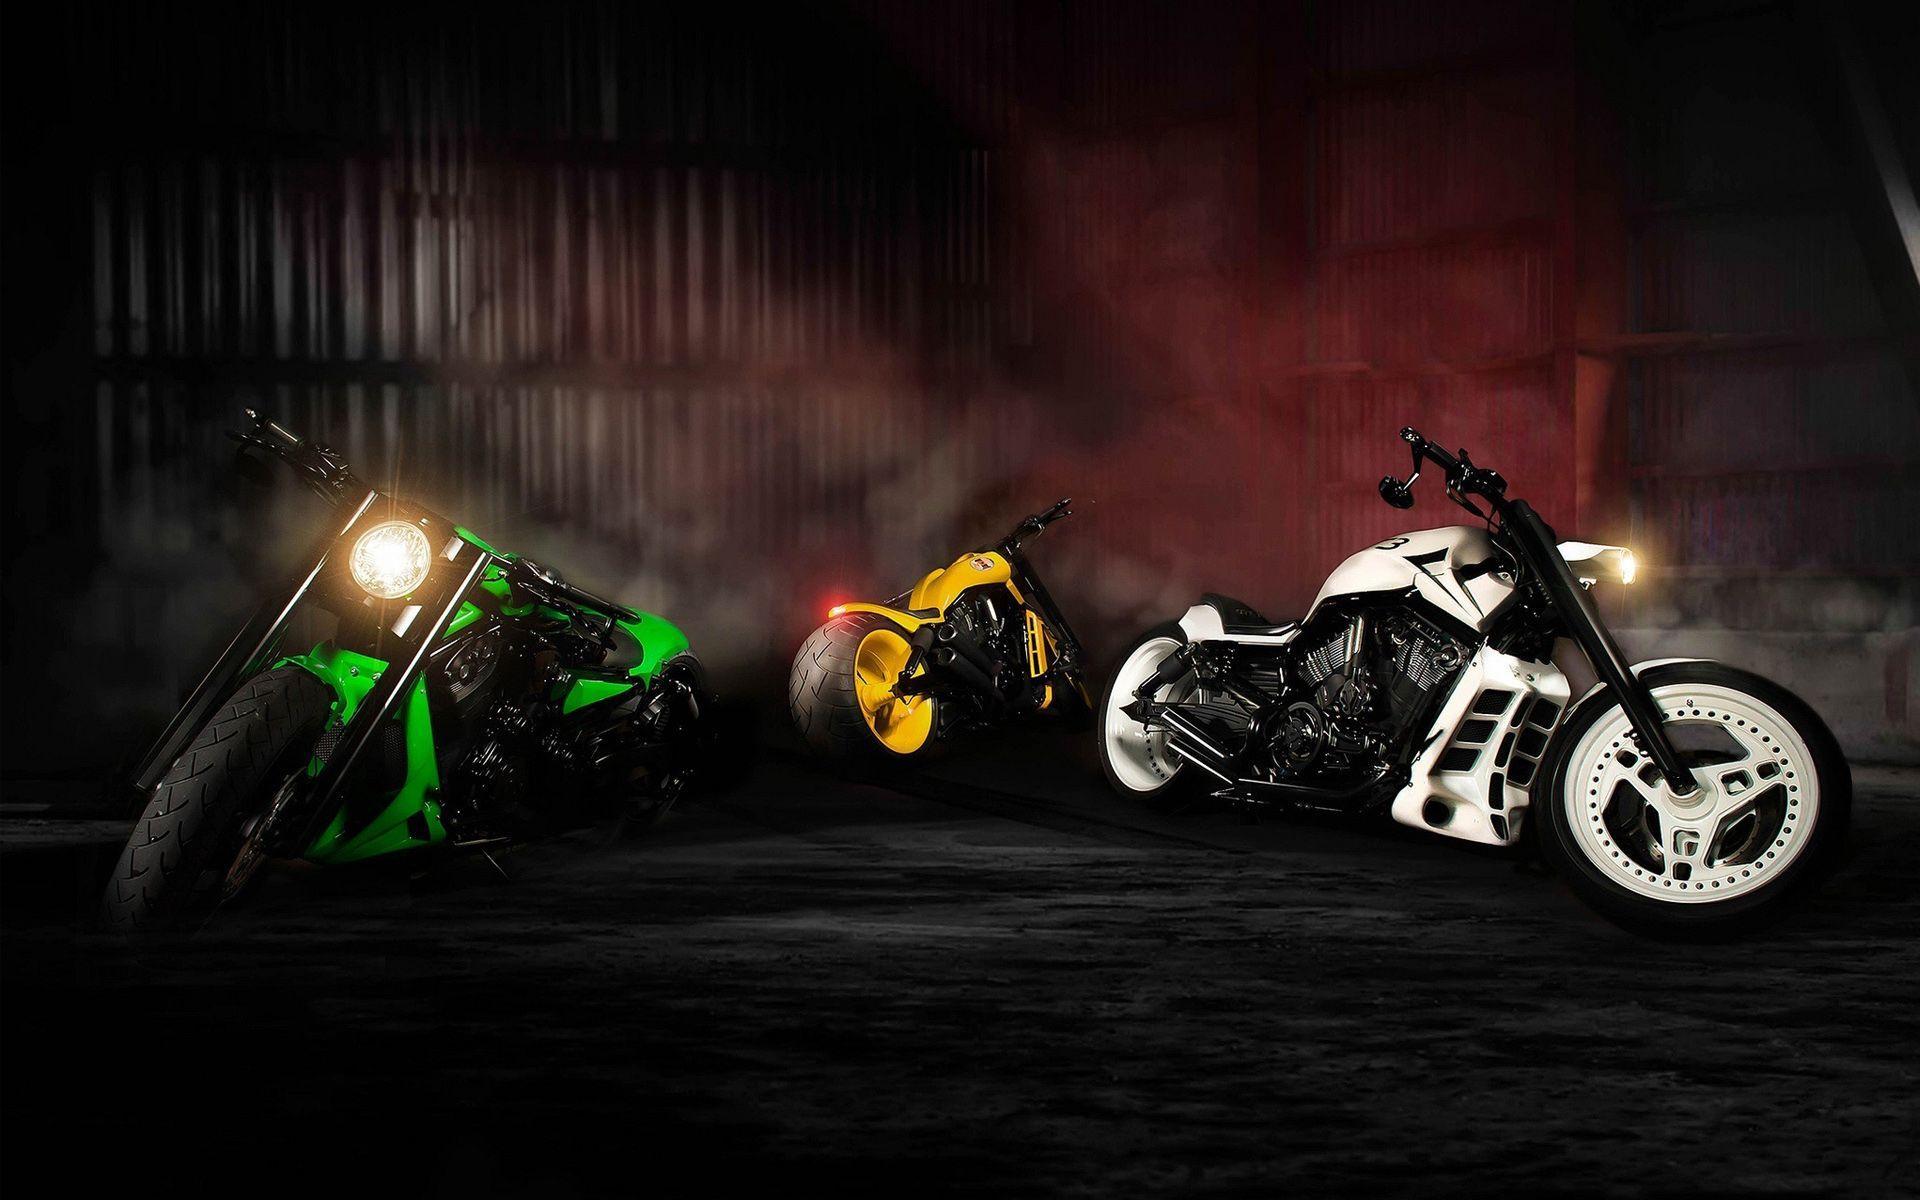 Hd Motorbike Wallpapers Top Free Hd Motorbike Backgrounds